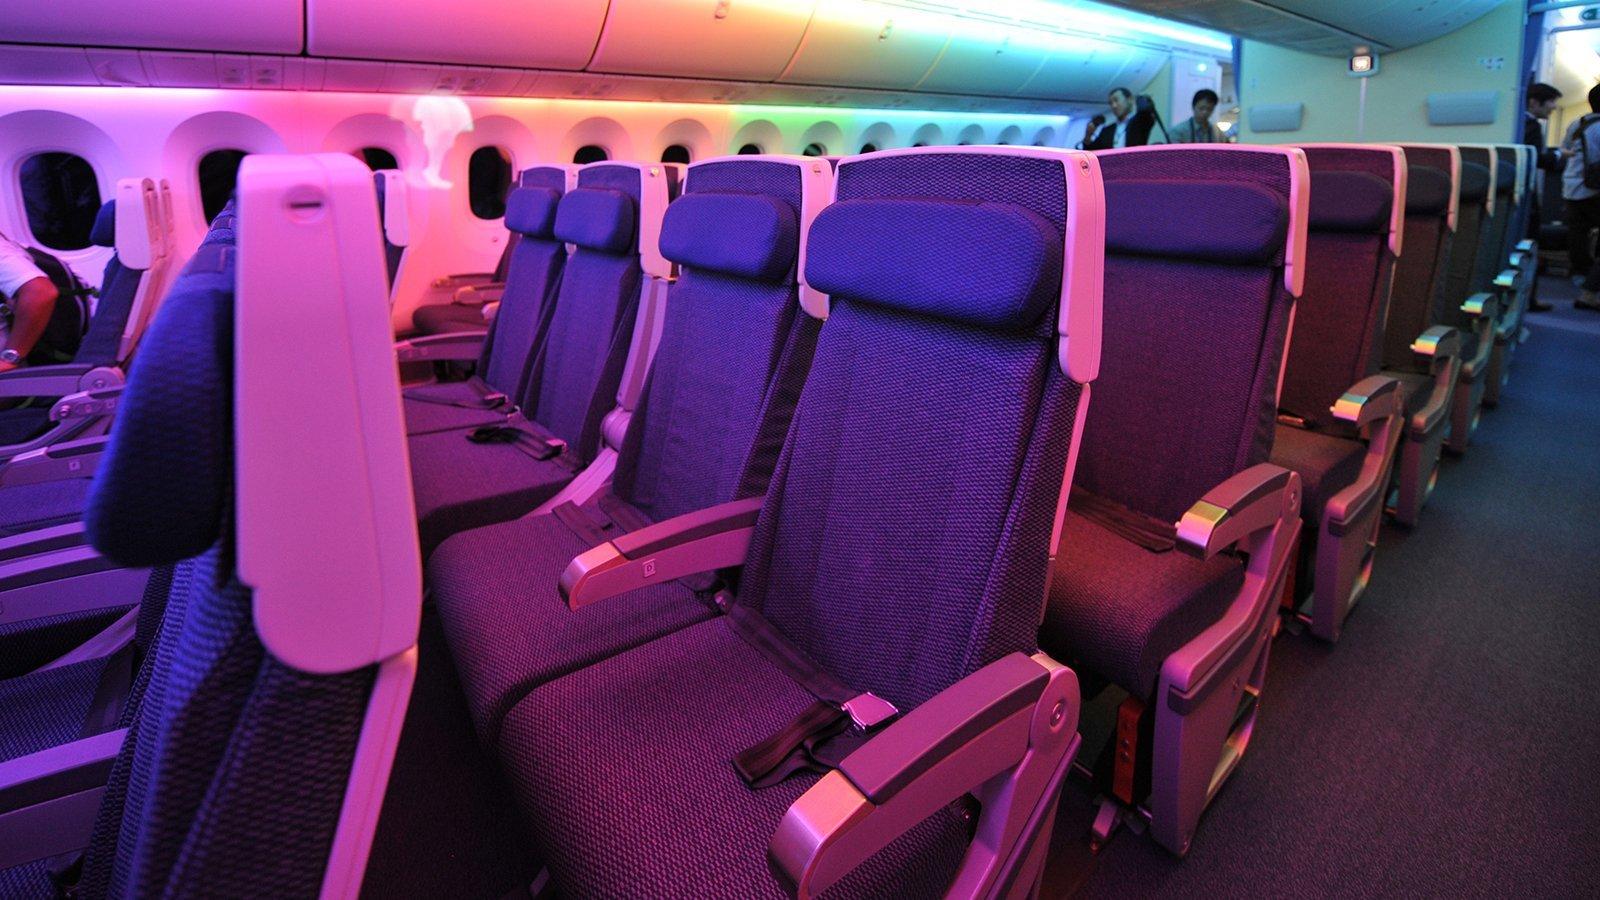 Flight attendant union calls cramped airplane seats 'torture'